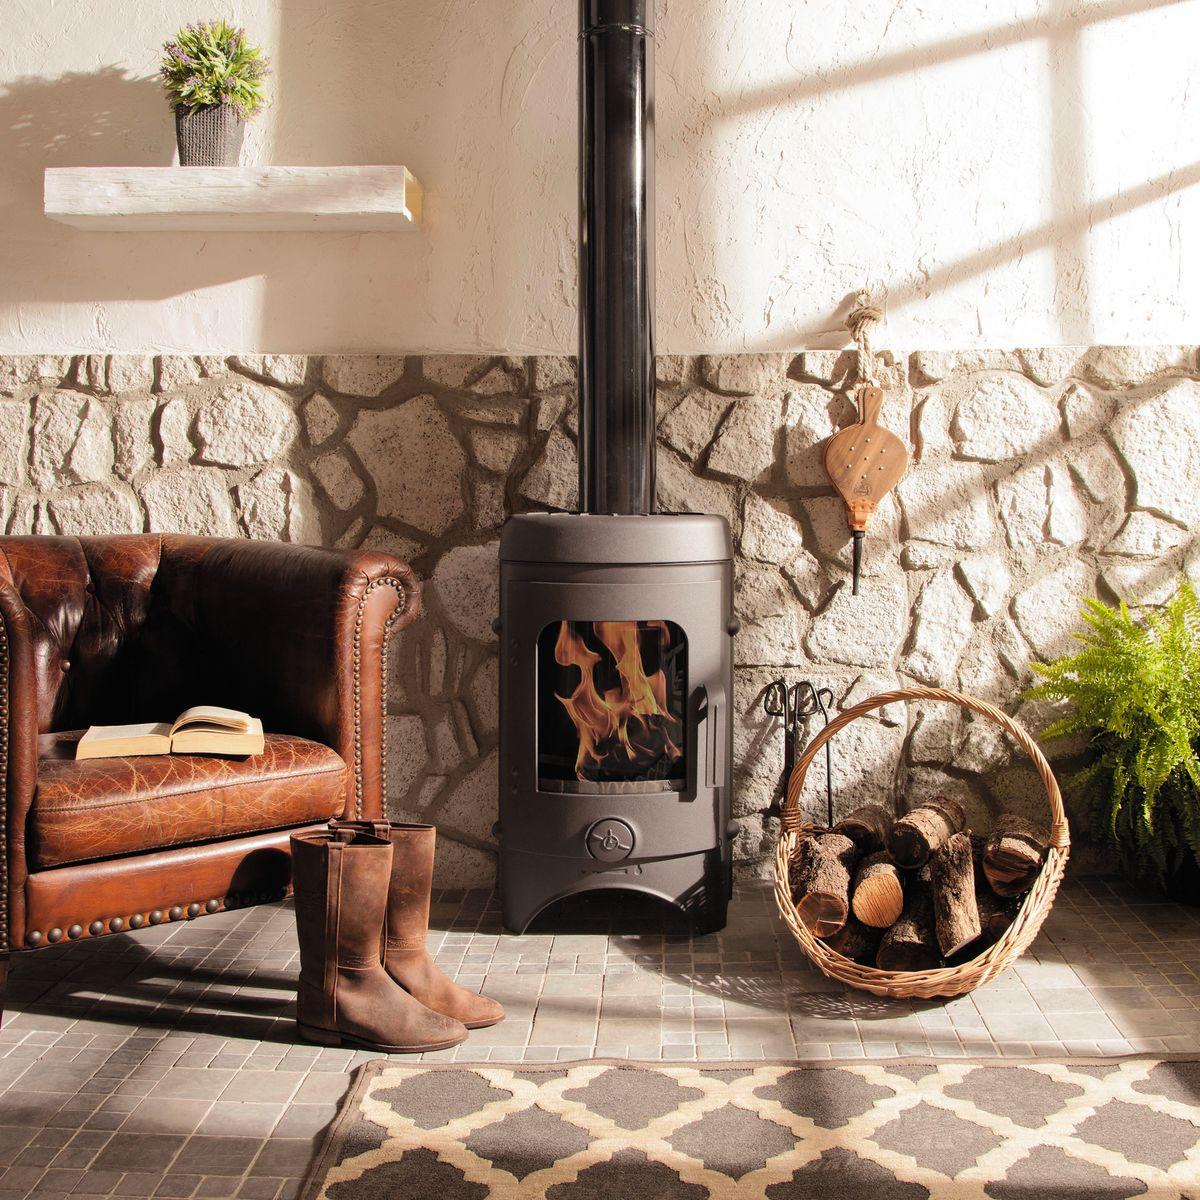 Stufe a legna: prezzi e offerte online per stufe a legna